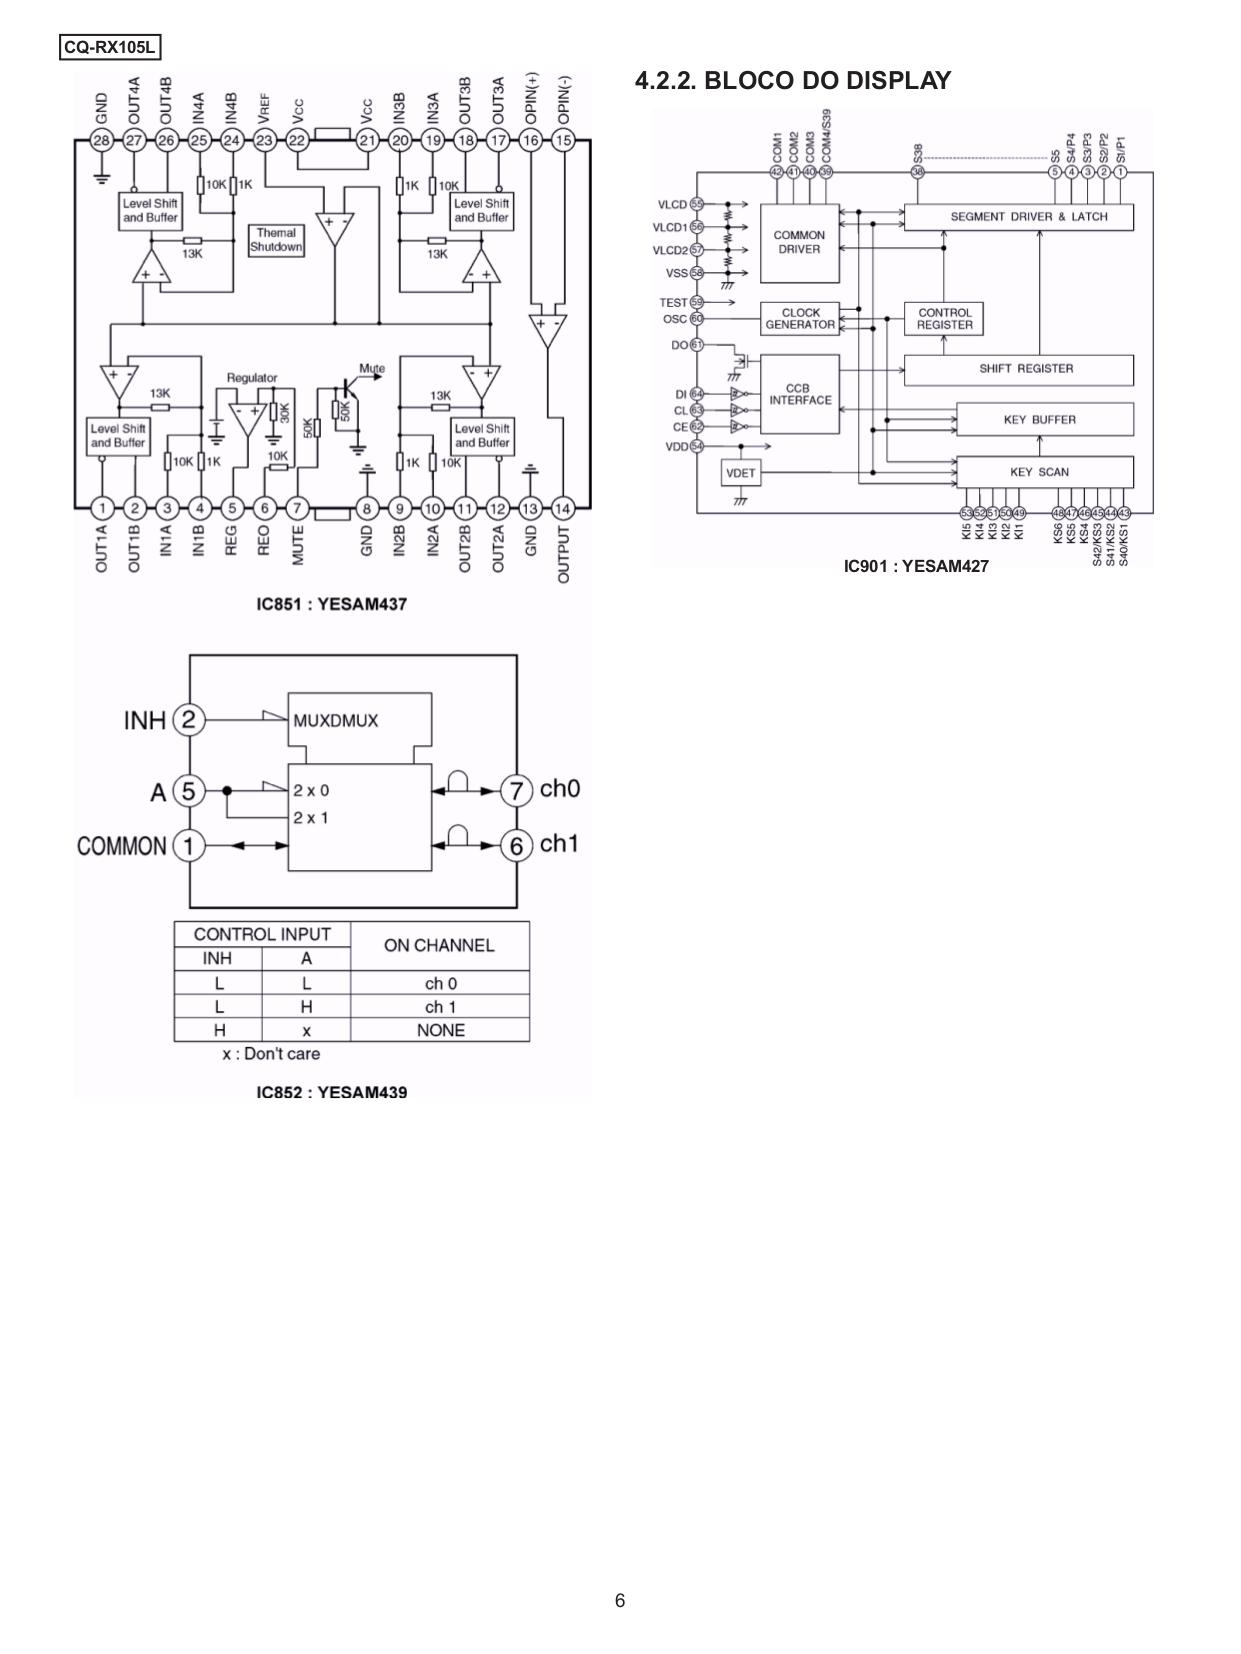 Groß Panasonic Cq Rx100u Schaltplan Fotos - Elektrische Schaltplan ...